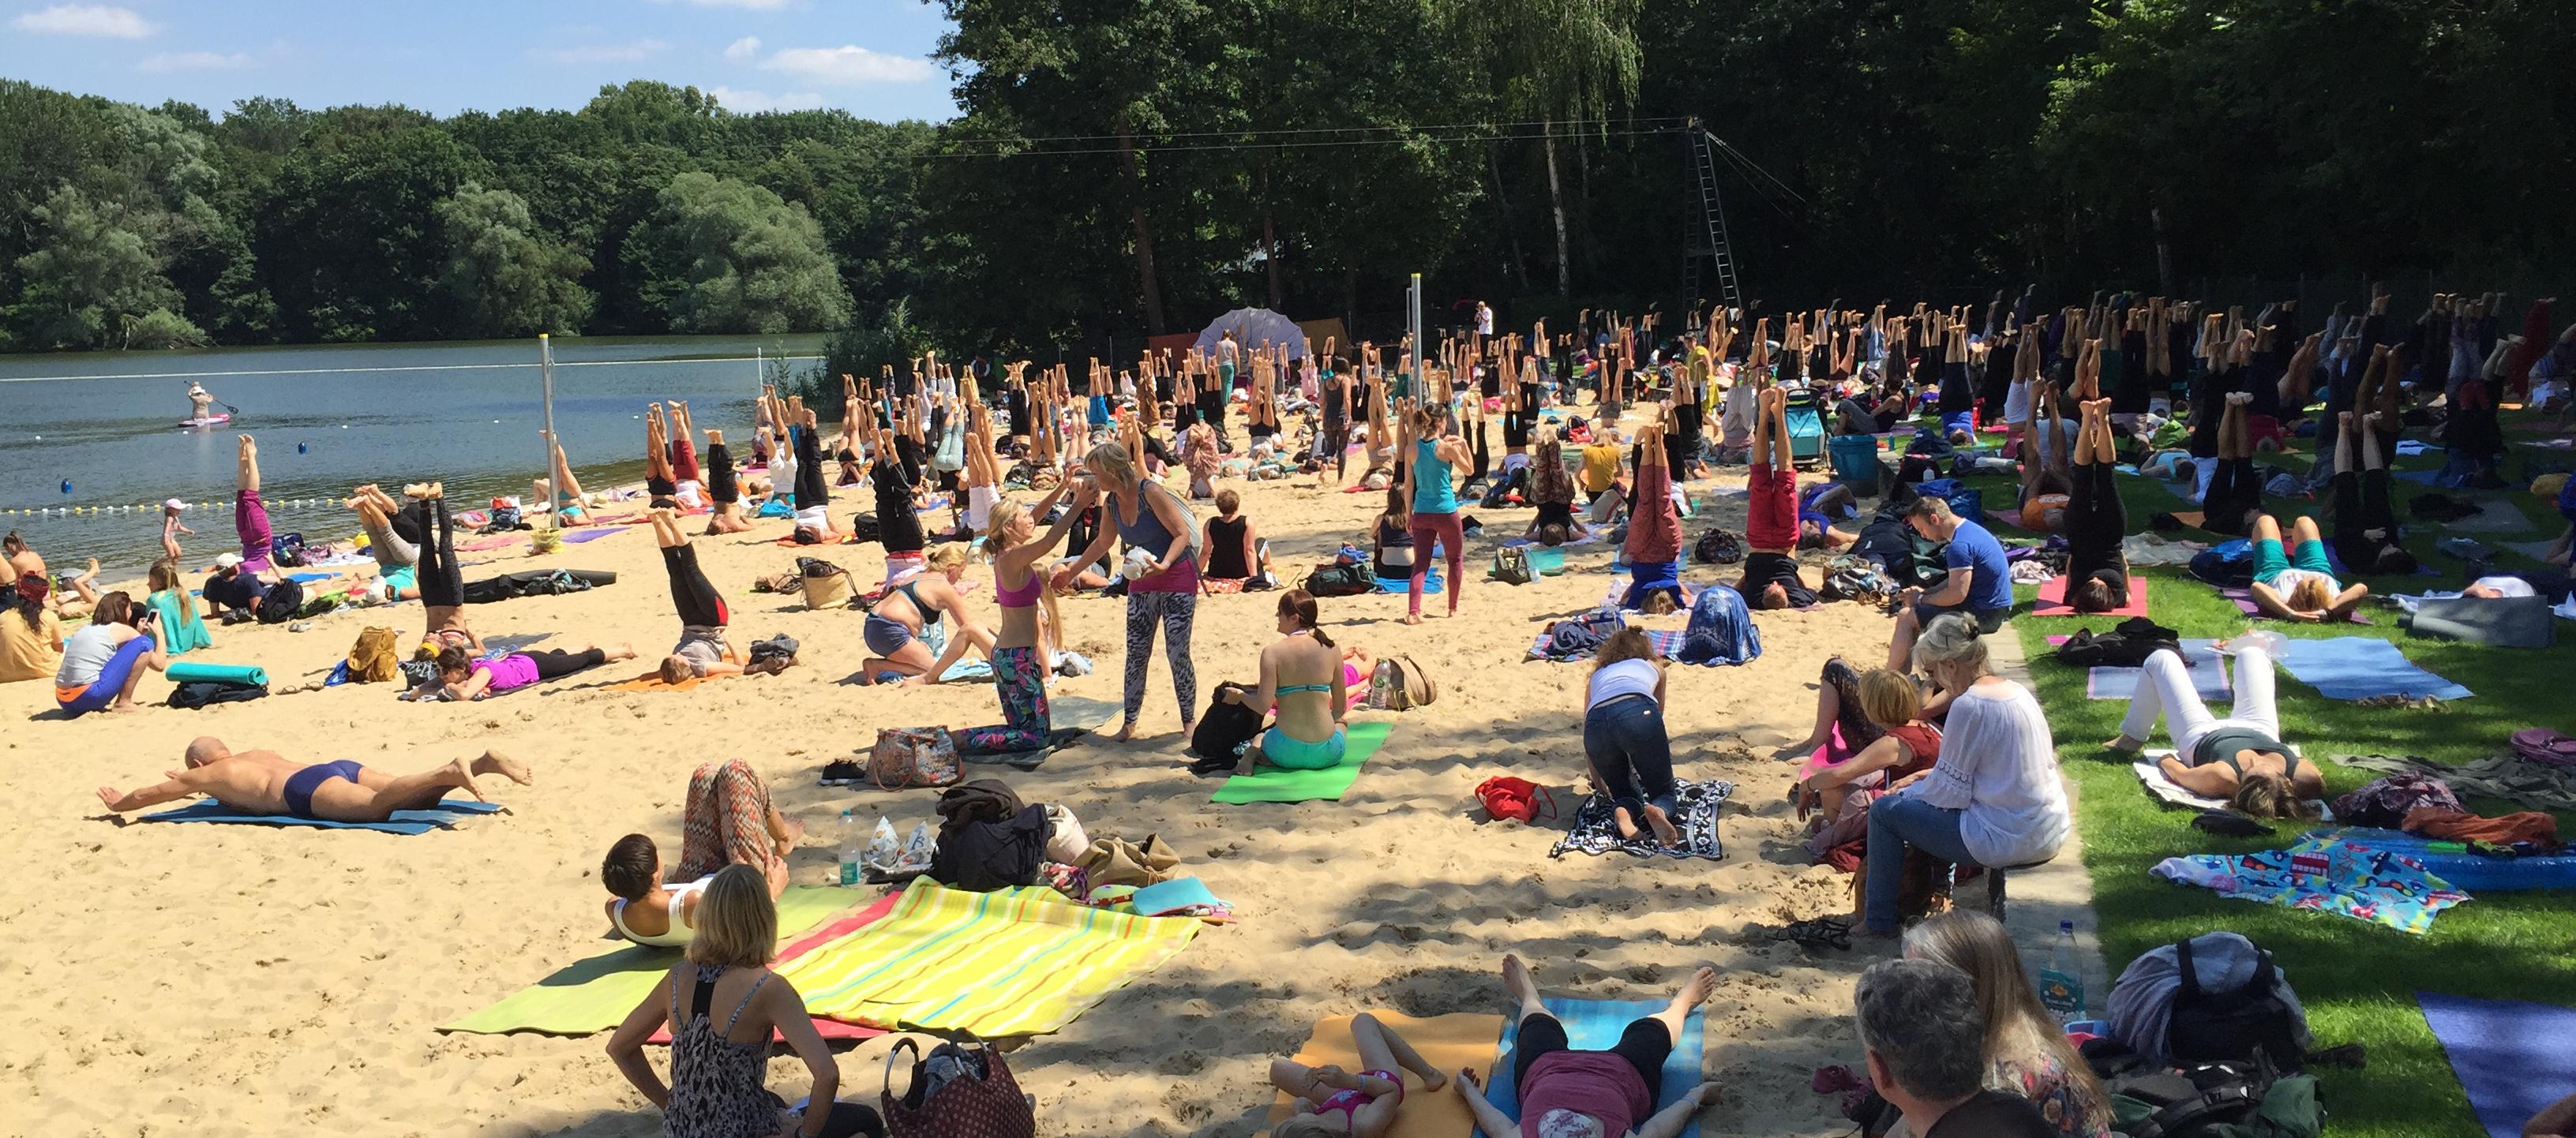 Foto vom Yoga-Tag Berlin 2016 im Strandbad Jungfernheide